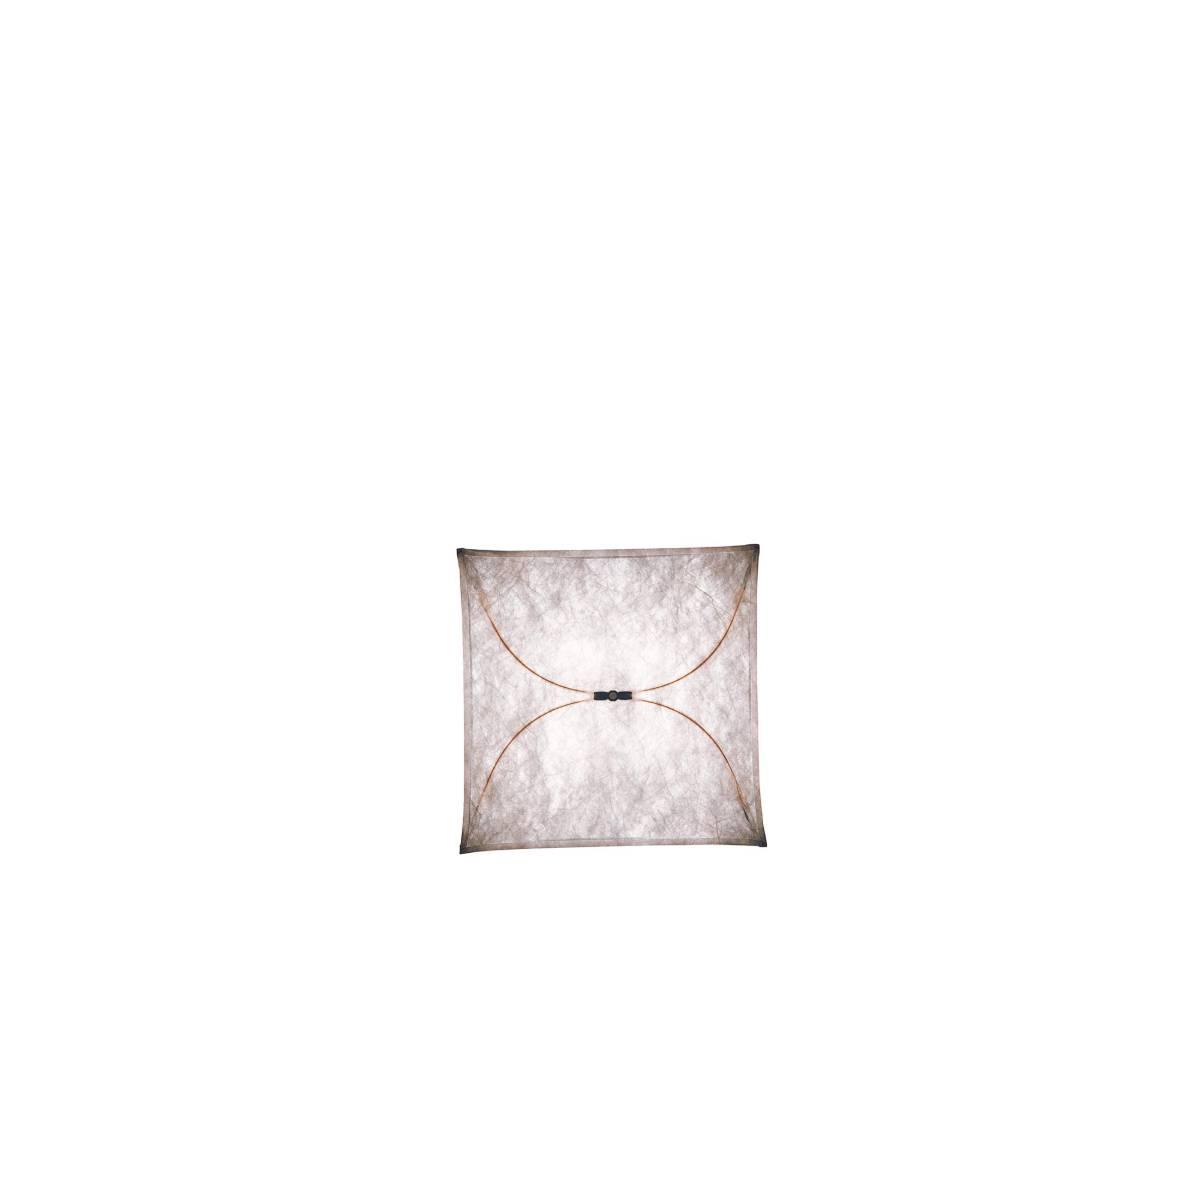 Flos Ariette 1 Wandlamp-Plafondlamp